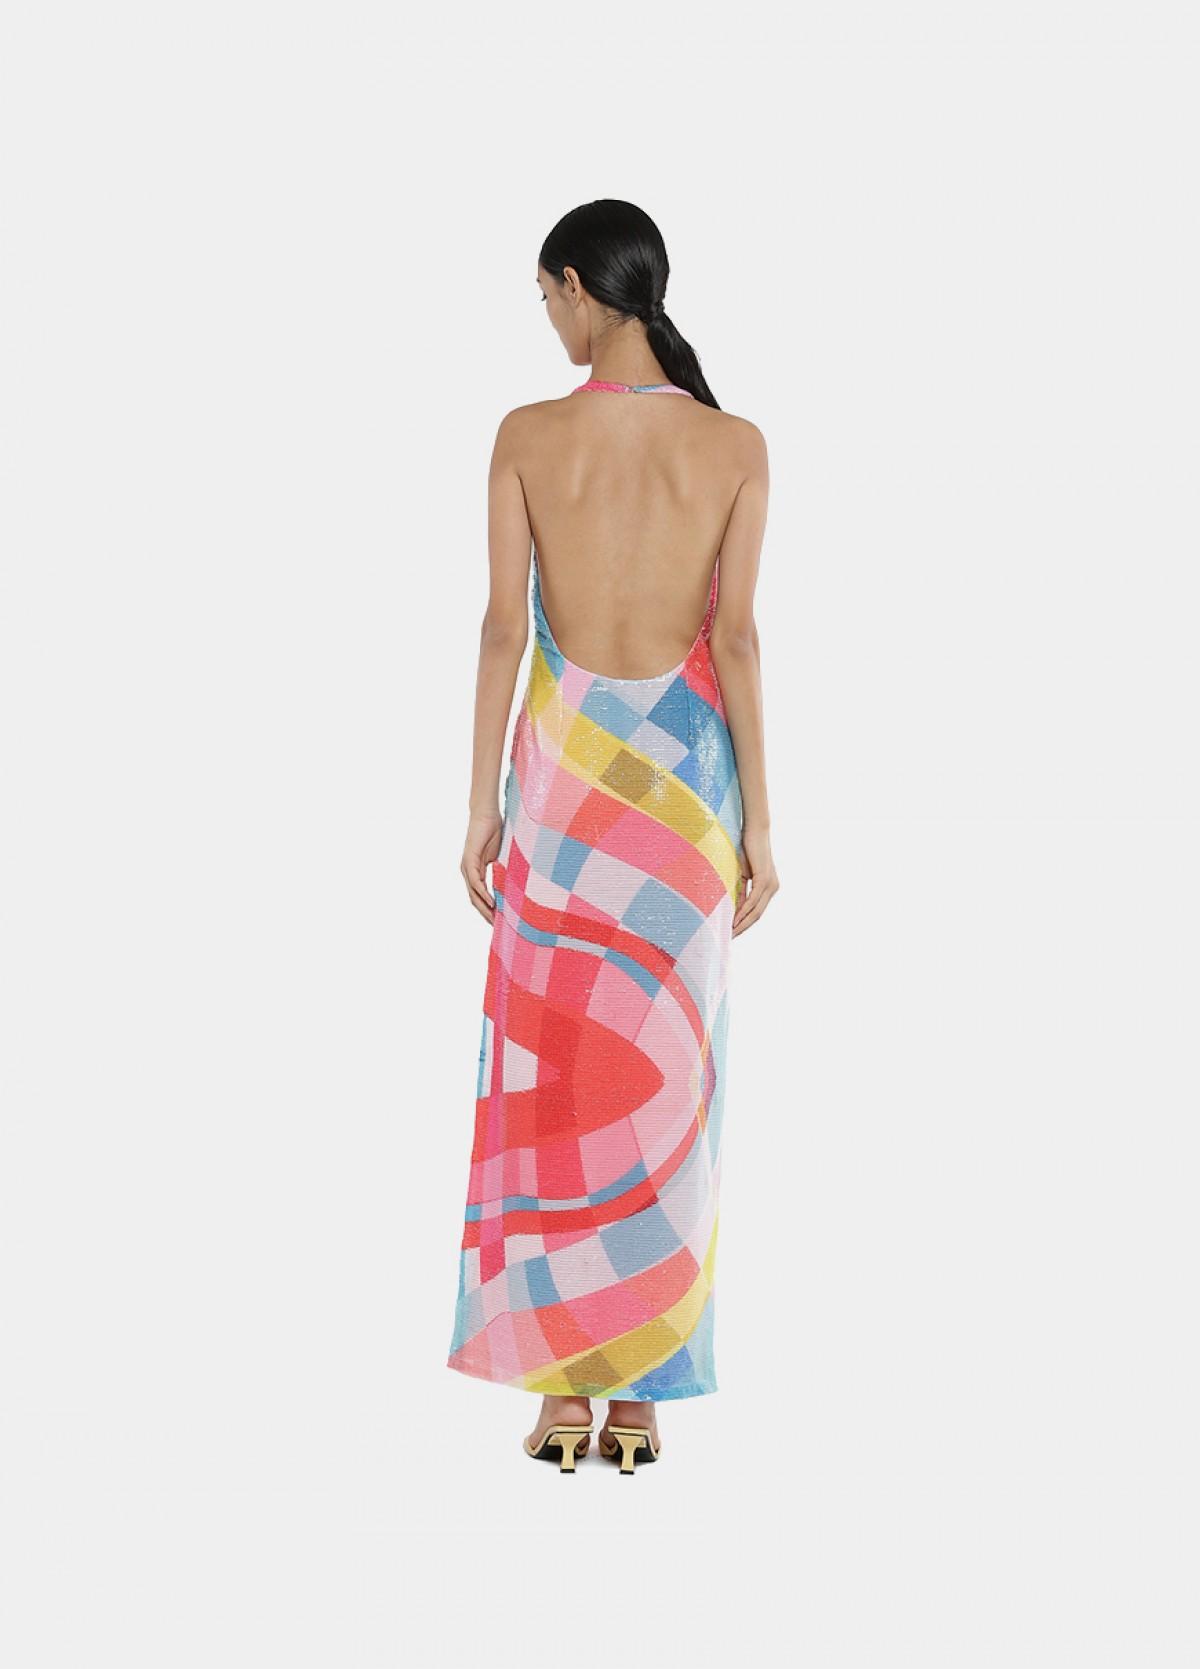 The Roseate Dress